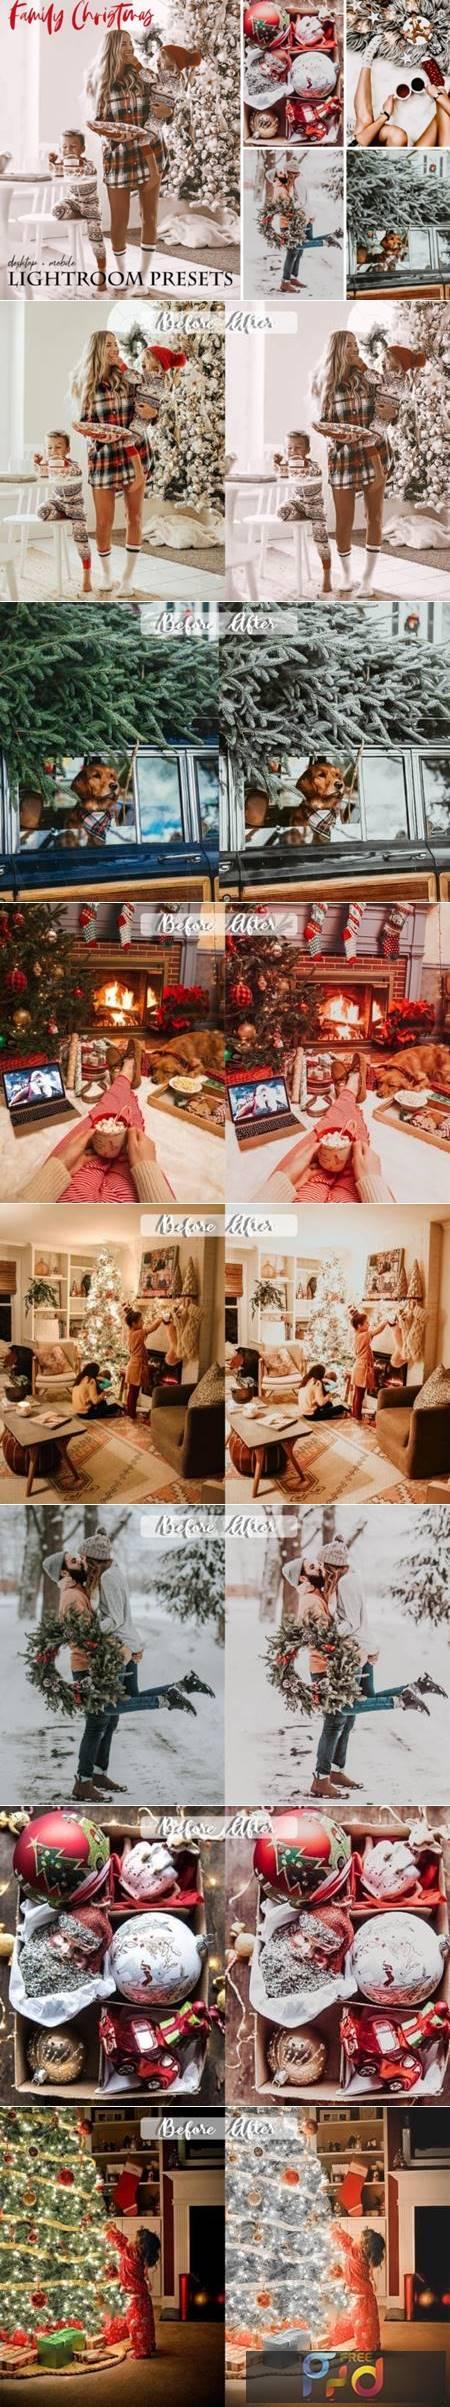 Family Christmas Lightroom Presets 5841097 1